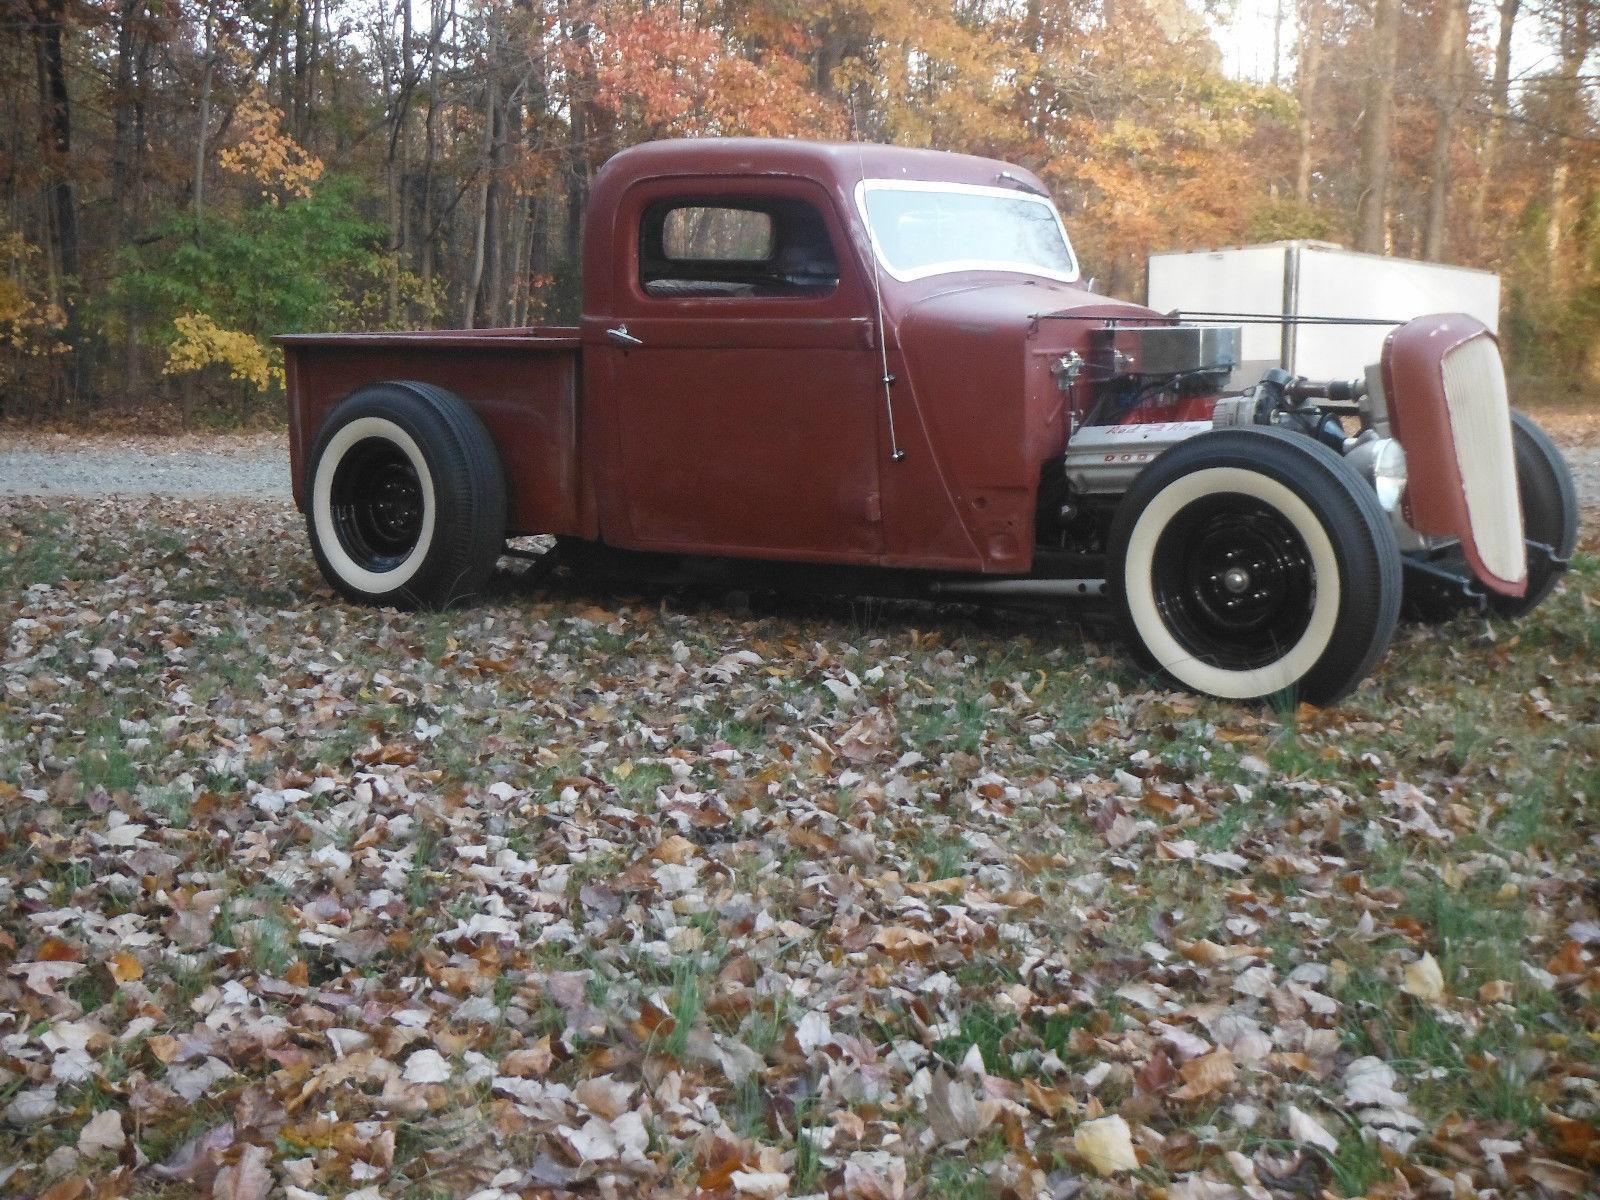 Hot Rod Rat Dodge Truck Classic Other 1936 For Sale 1949 Stepside Prevnext